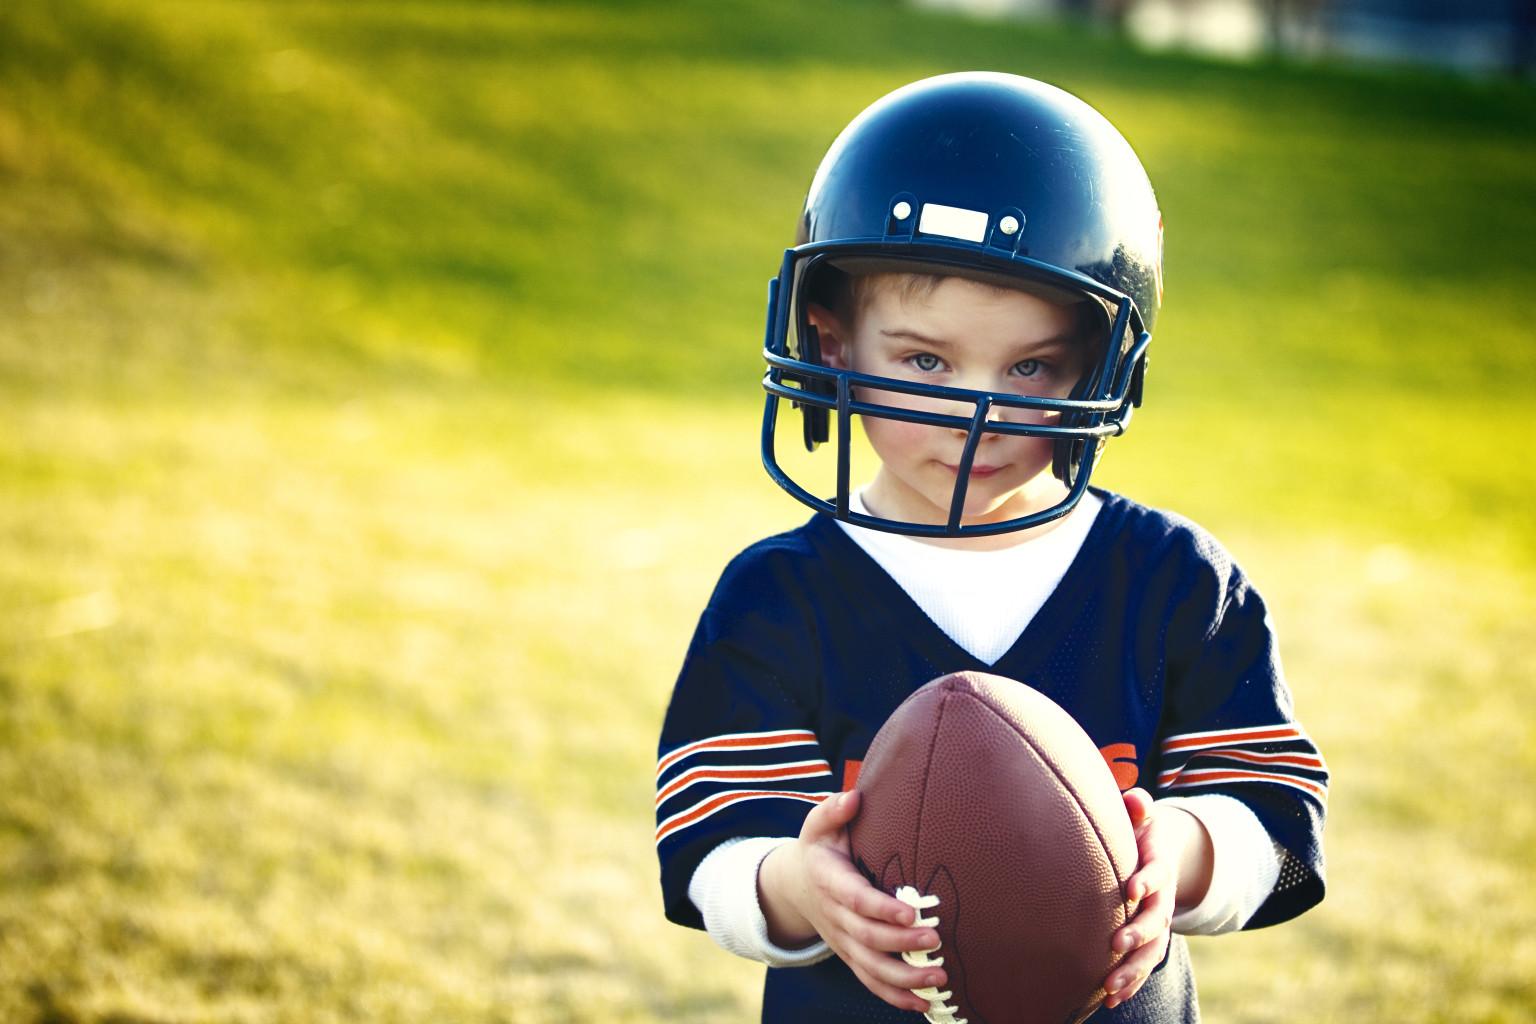 Little boys playing american football